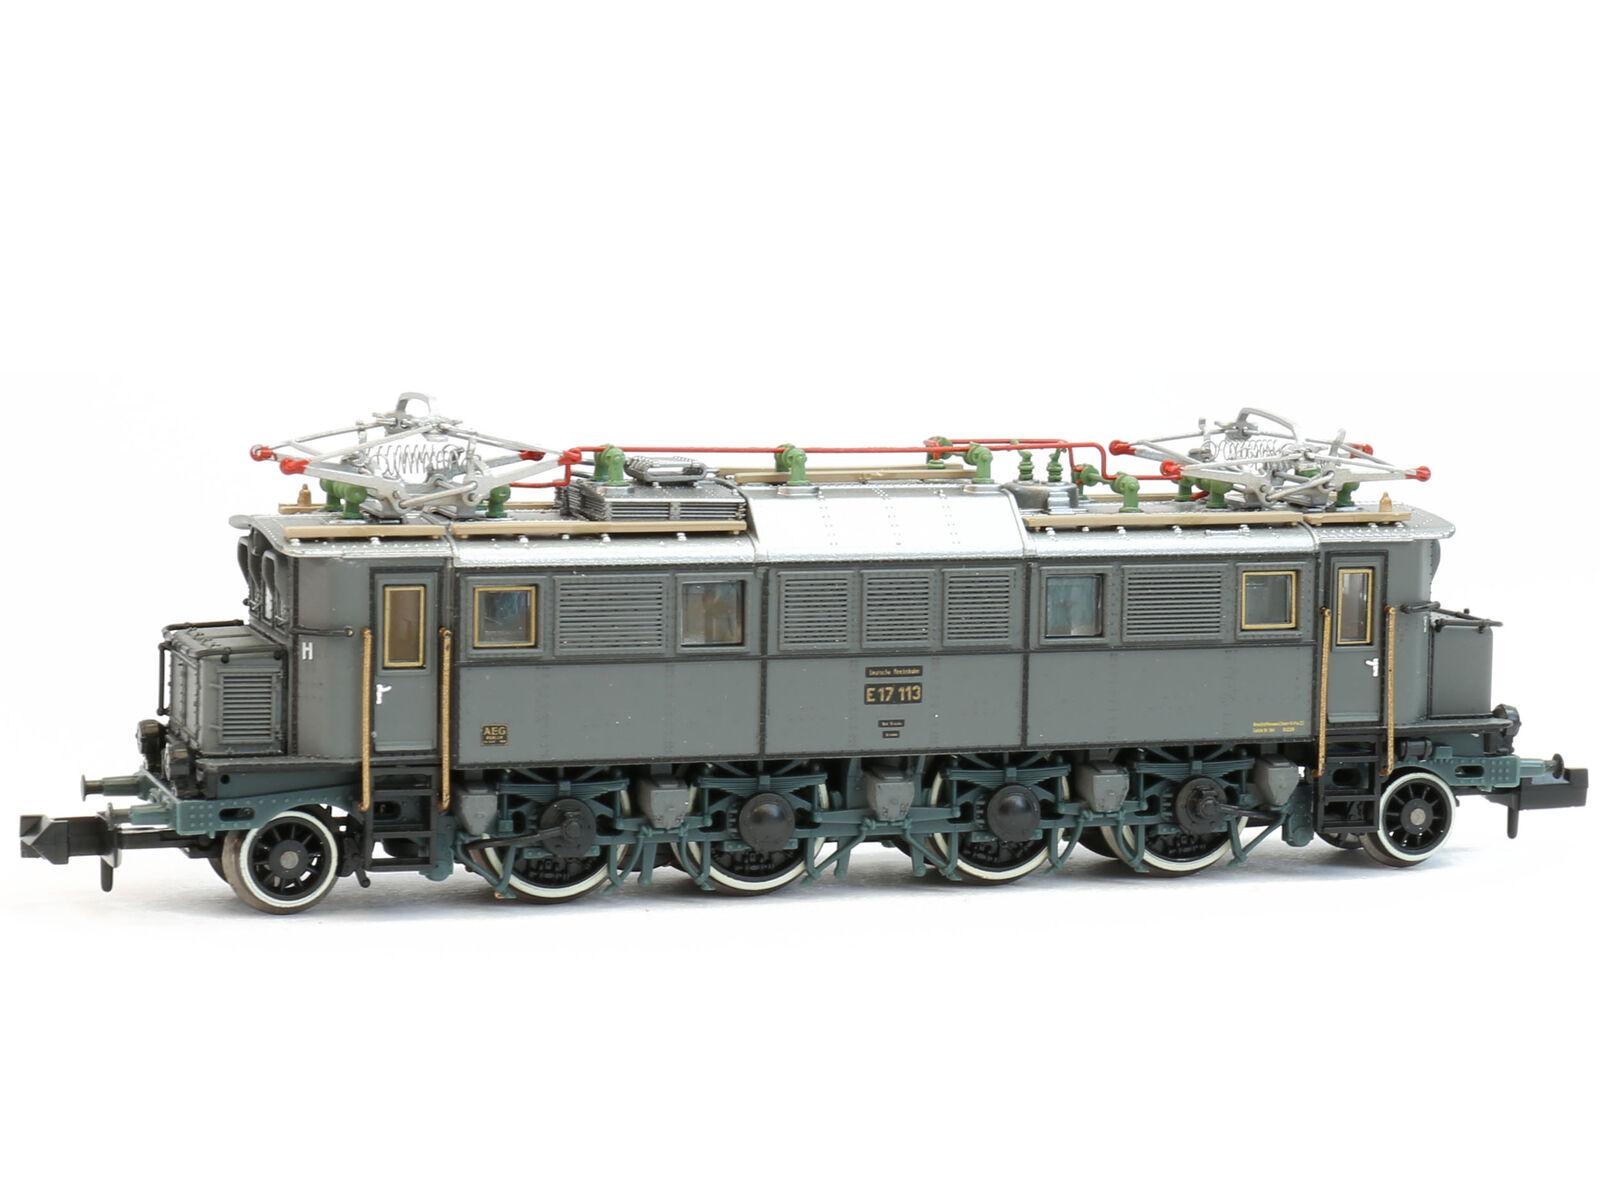 Hobbytrain h2890s-DCC SOUND Elektrolok BR e17 DRG grigio, Ep. II-Spur N-NUOVO